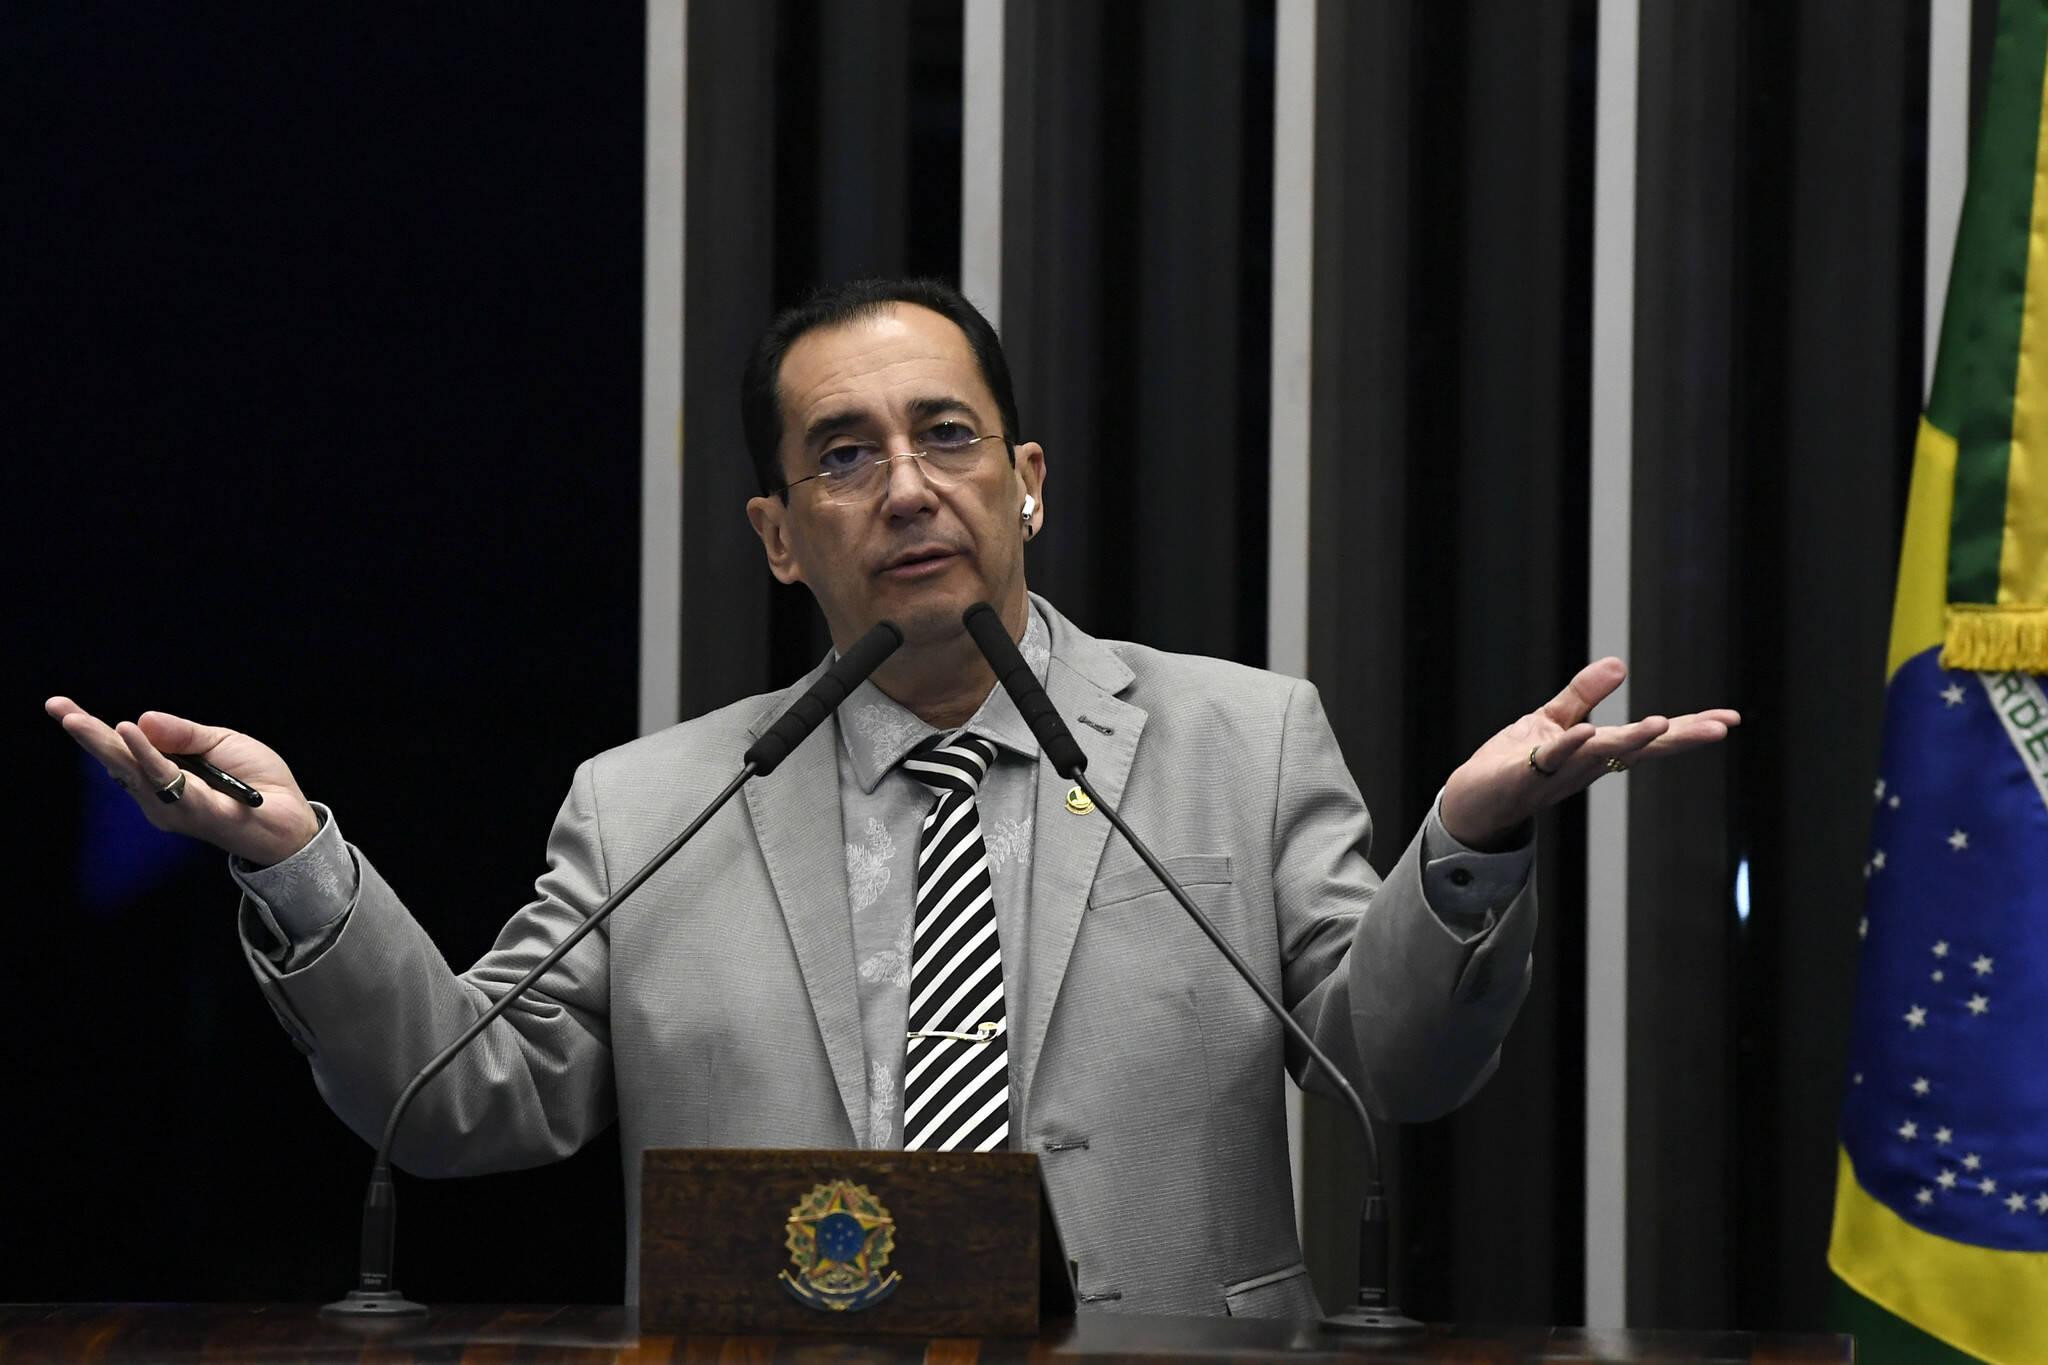 Senador Jorge Kajuru (Patriota-GO). Foto: Jefferson Rudy/Agência Senado - 15.8.19